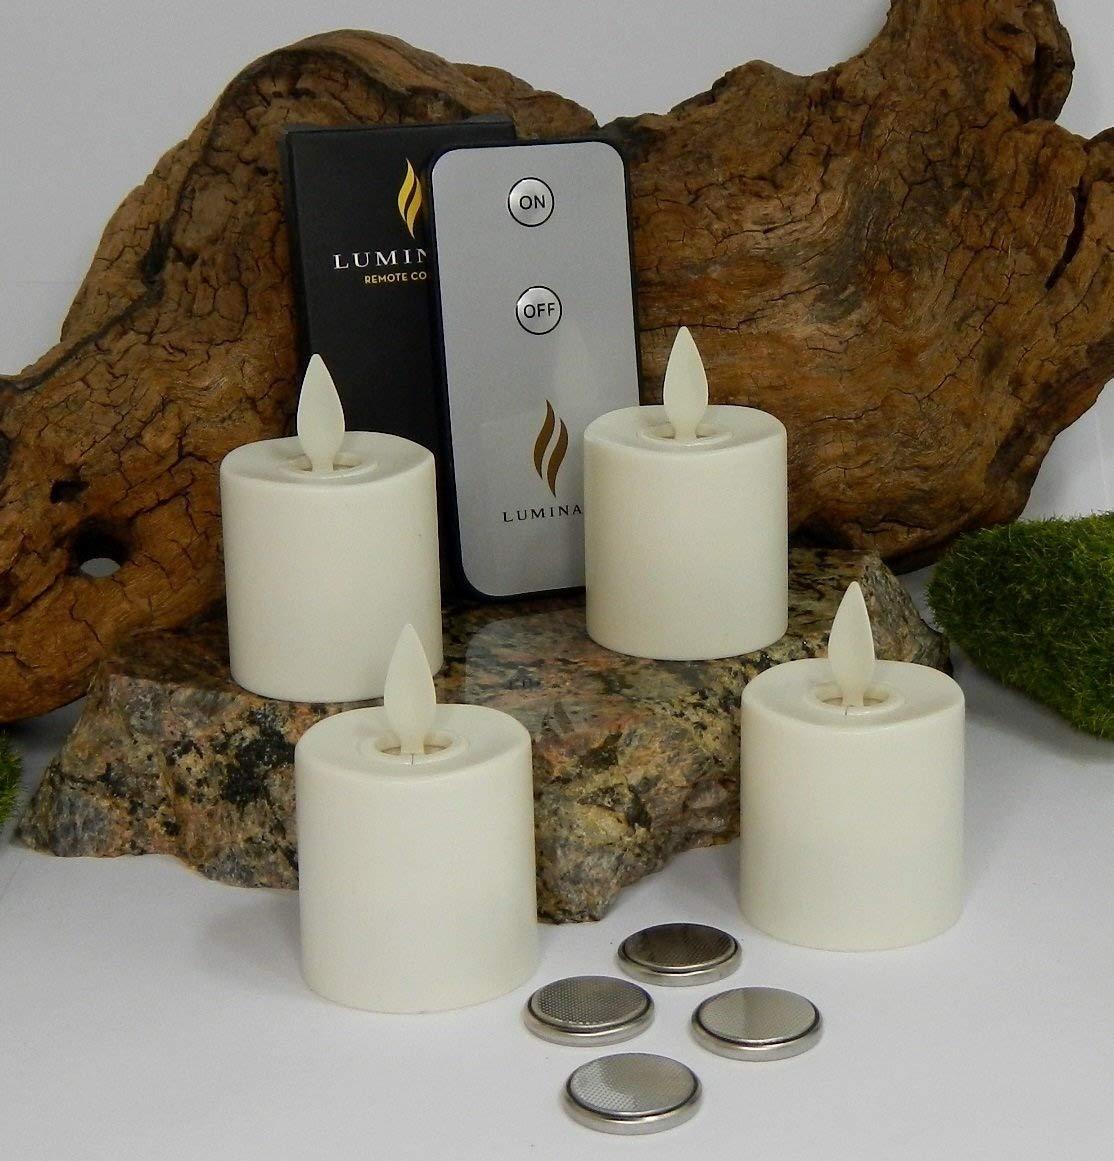 4pc Luminara Flameless BATTERY OPERATED Tea Light Candles Set White 3.7cm x 3.2cm Auto-Timer BONUS REMOTE CONTROL INCLUDED B071YSYD4J